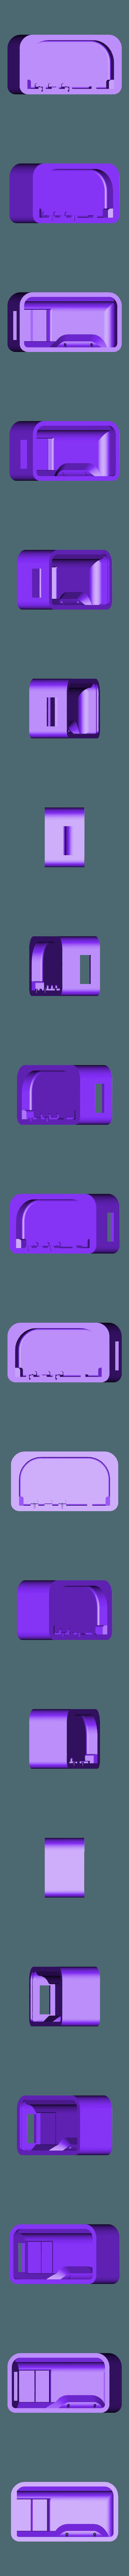 D-LI90_USB_Charger_v5-2_BASE.STL Download free STL file D-LI90 USB Charger v2 • 3D print design, WalterHsiao